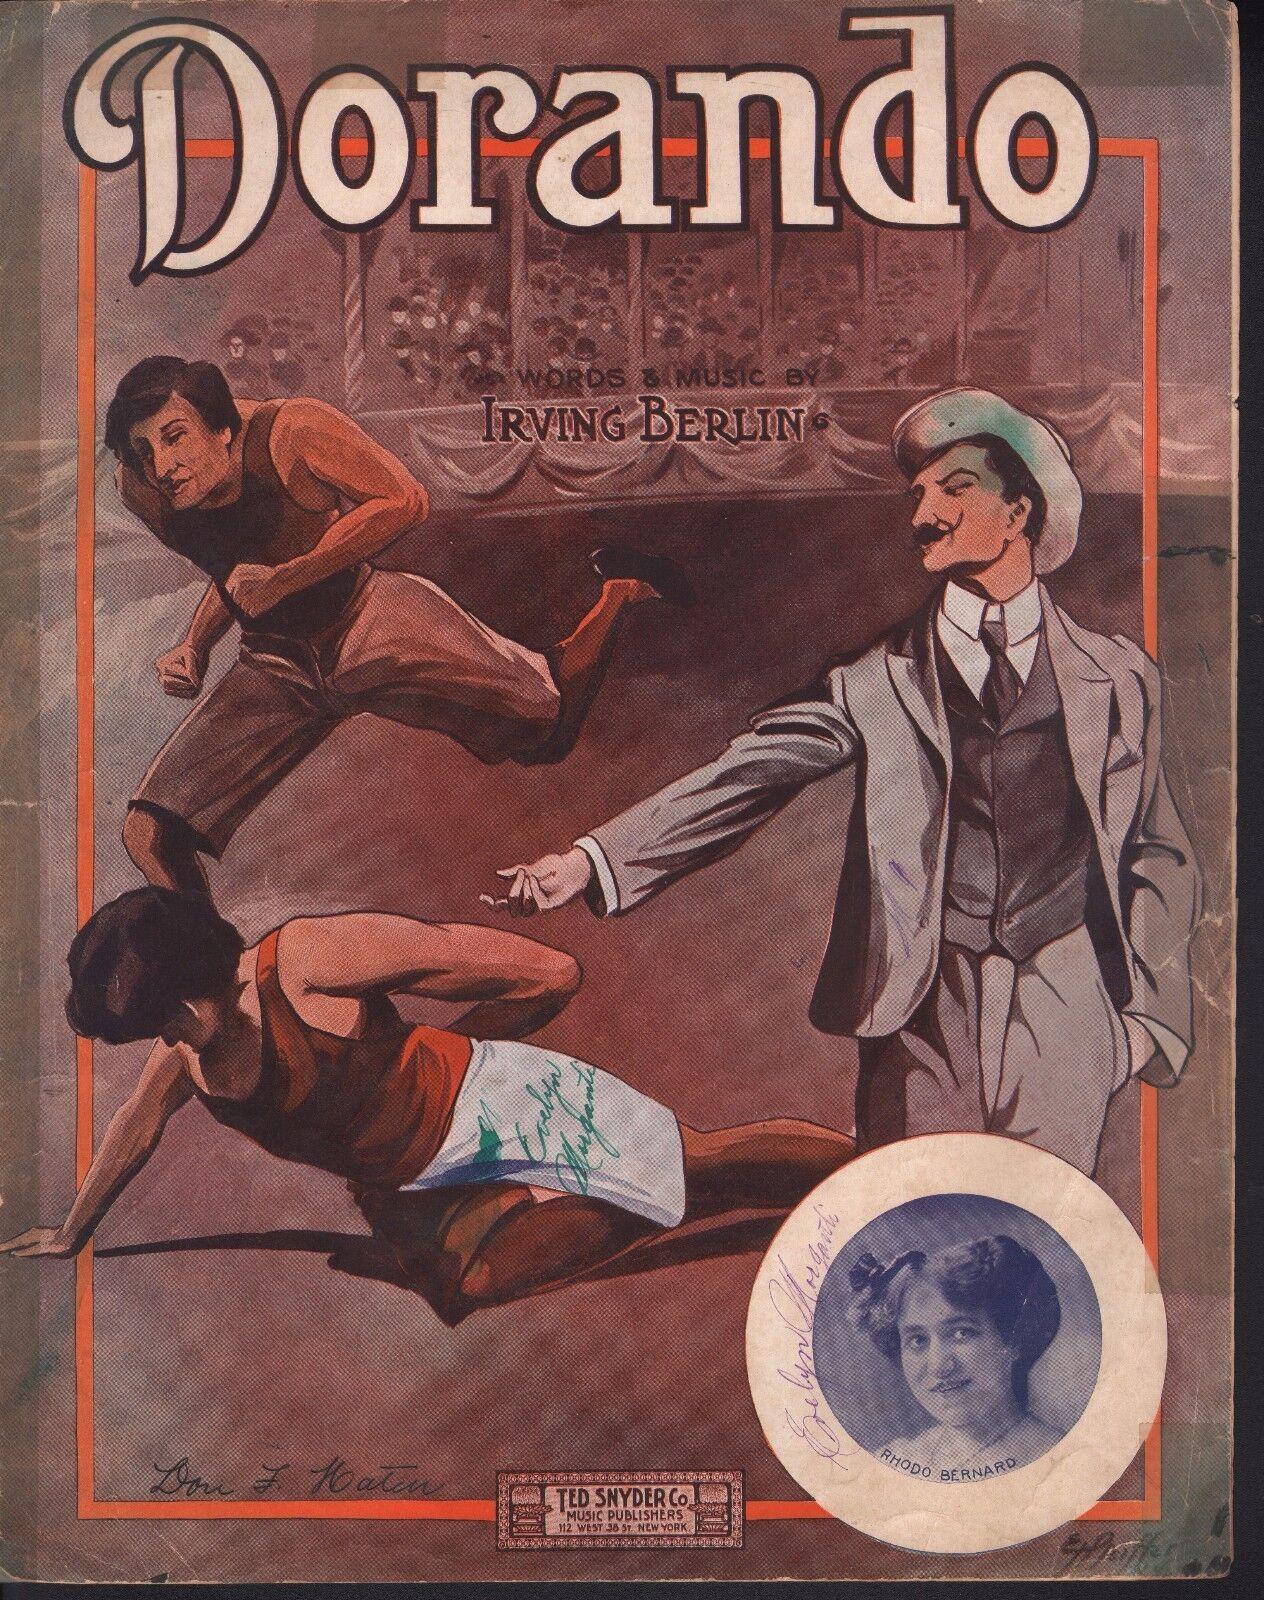 Dorando 1909 Very Early Irving Berlin Large Format Sheet Music